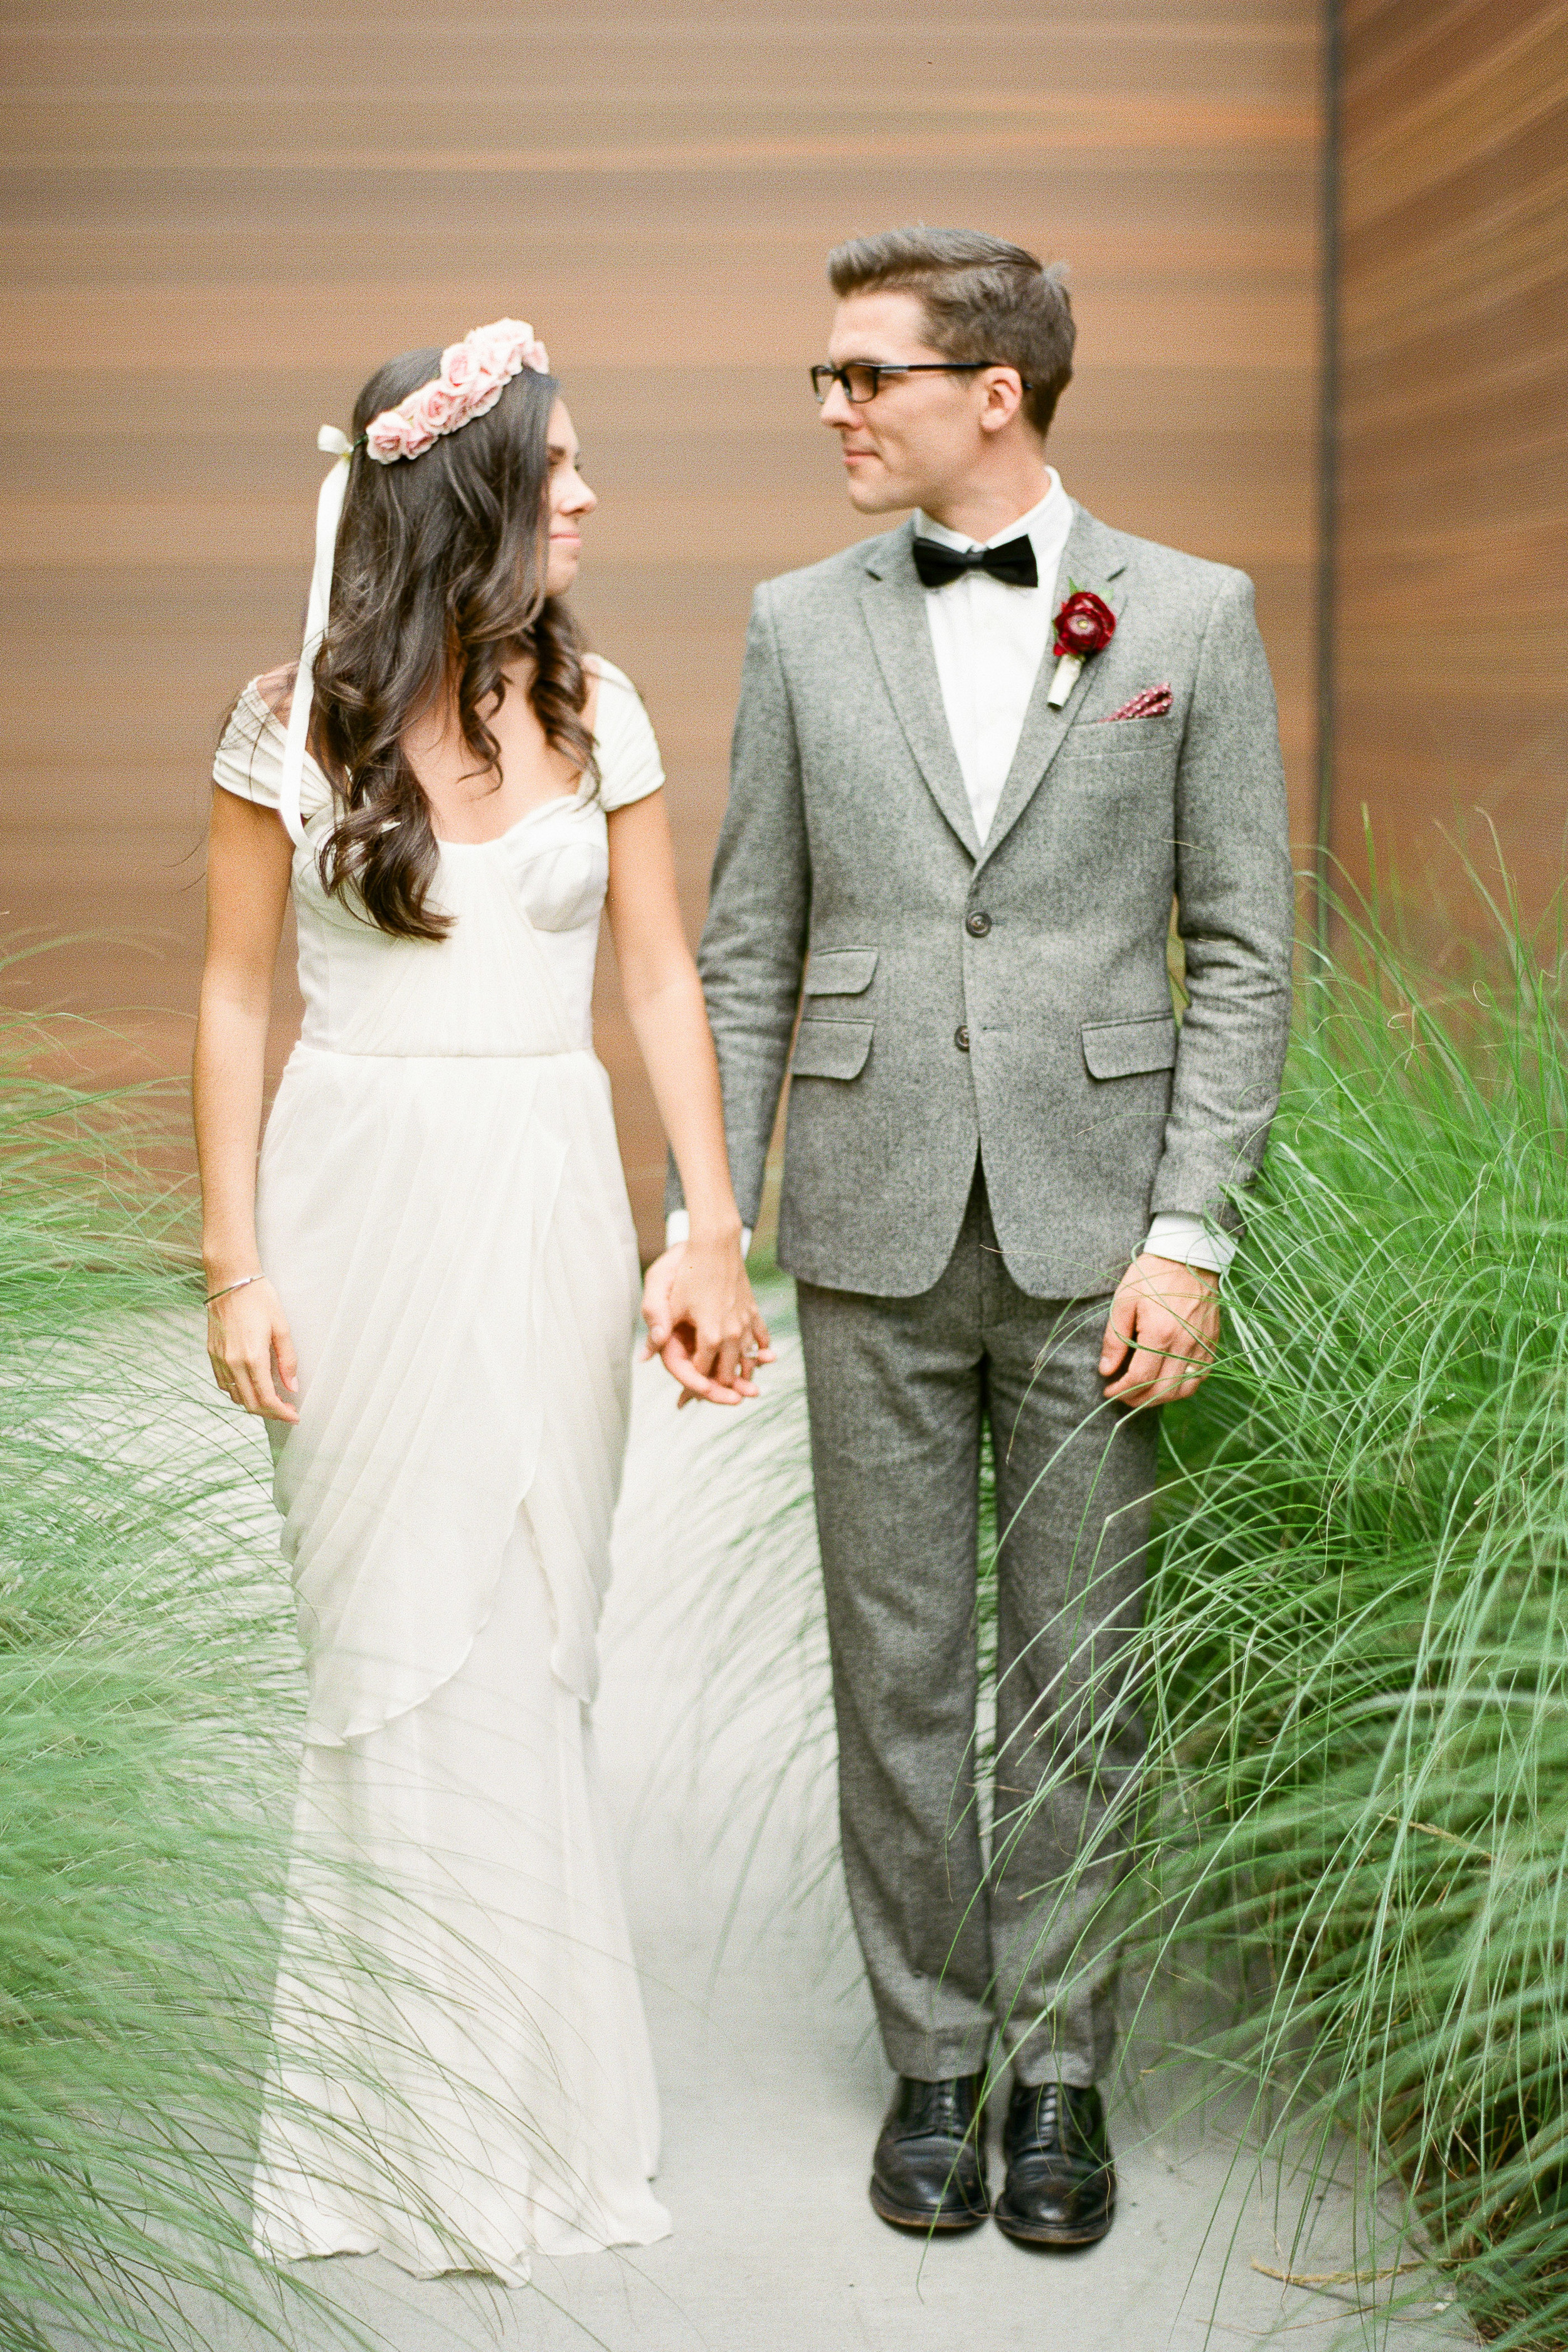 the_green_building_brooklyn_wedding_brklyn view photography_hanaluluco_72.jpg